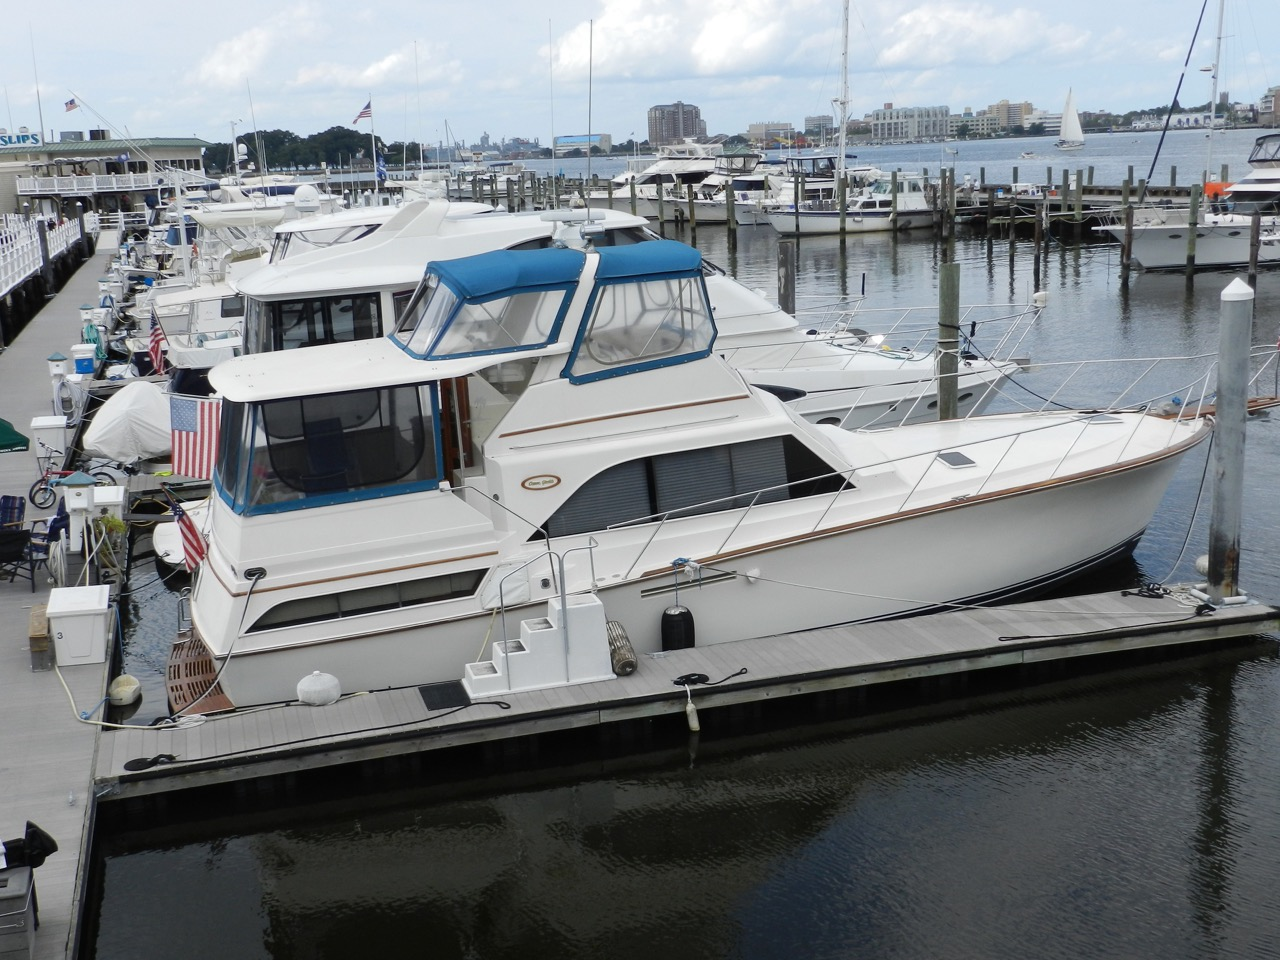 Ocean Yachts Sunliner Ocean Yachts 46 Profile